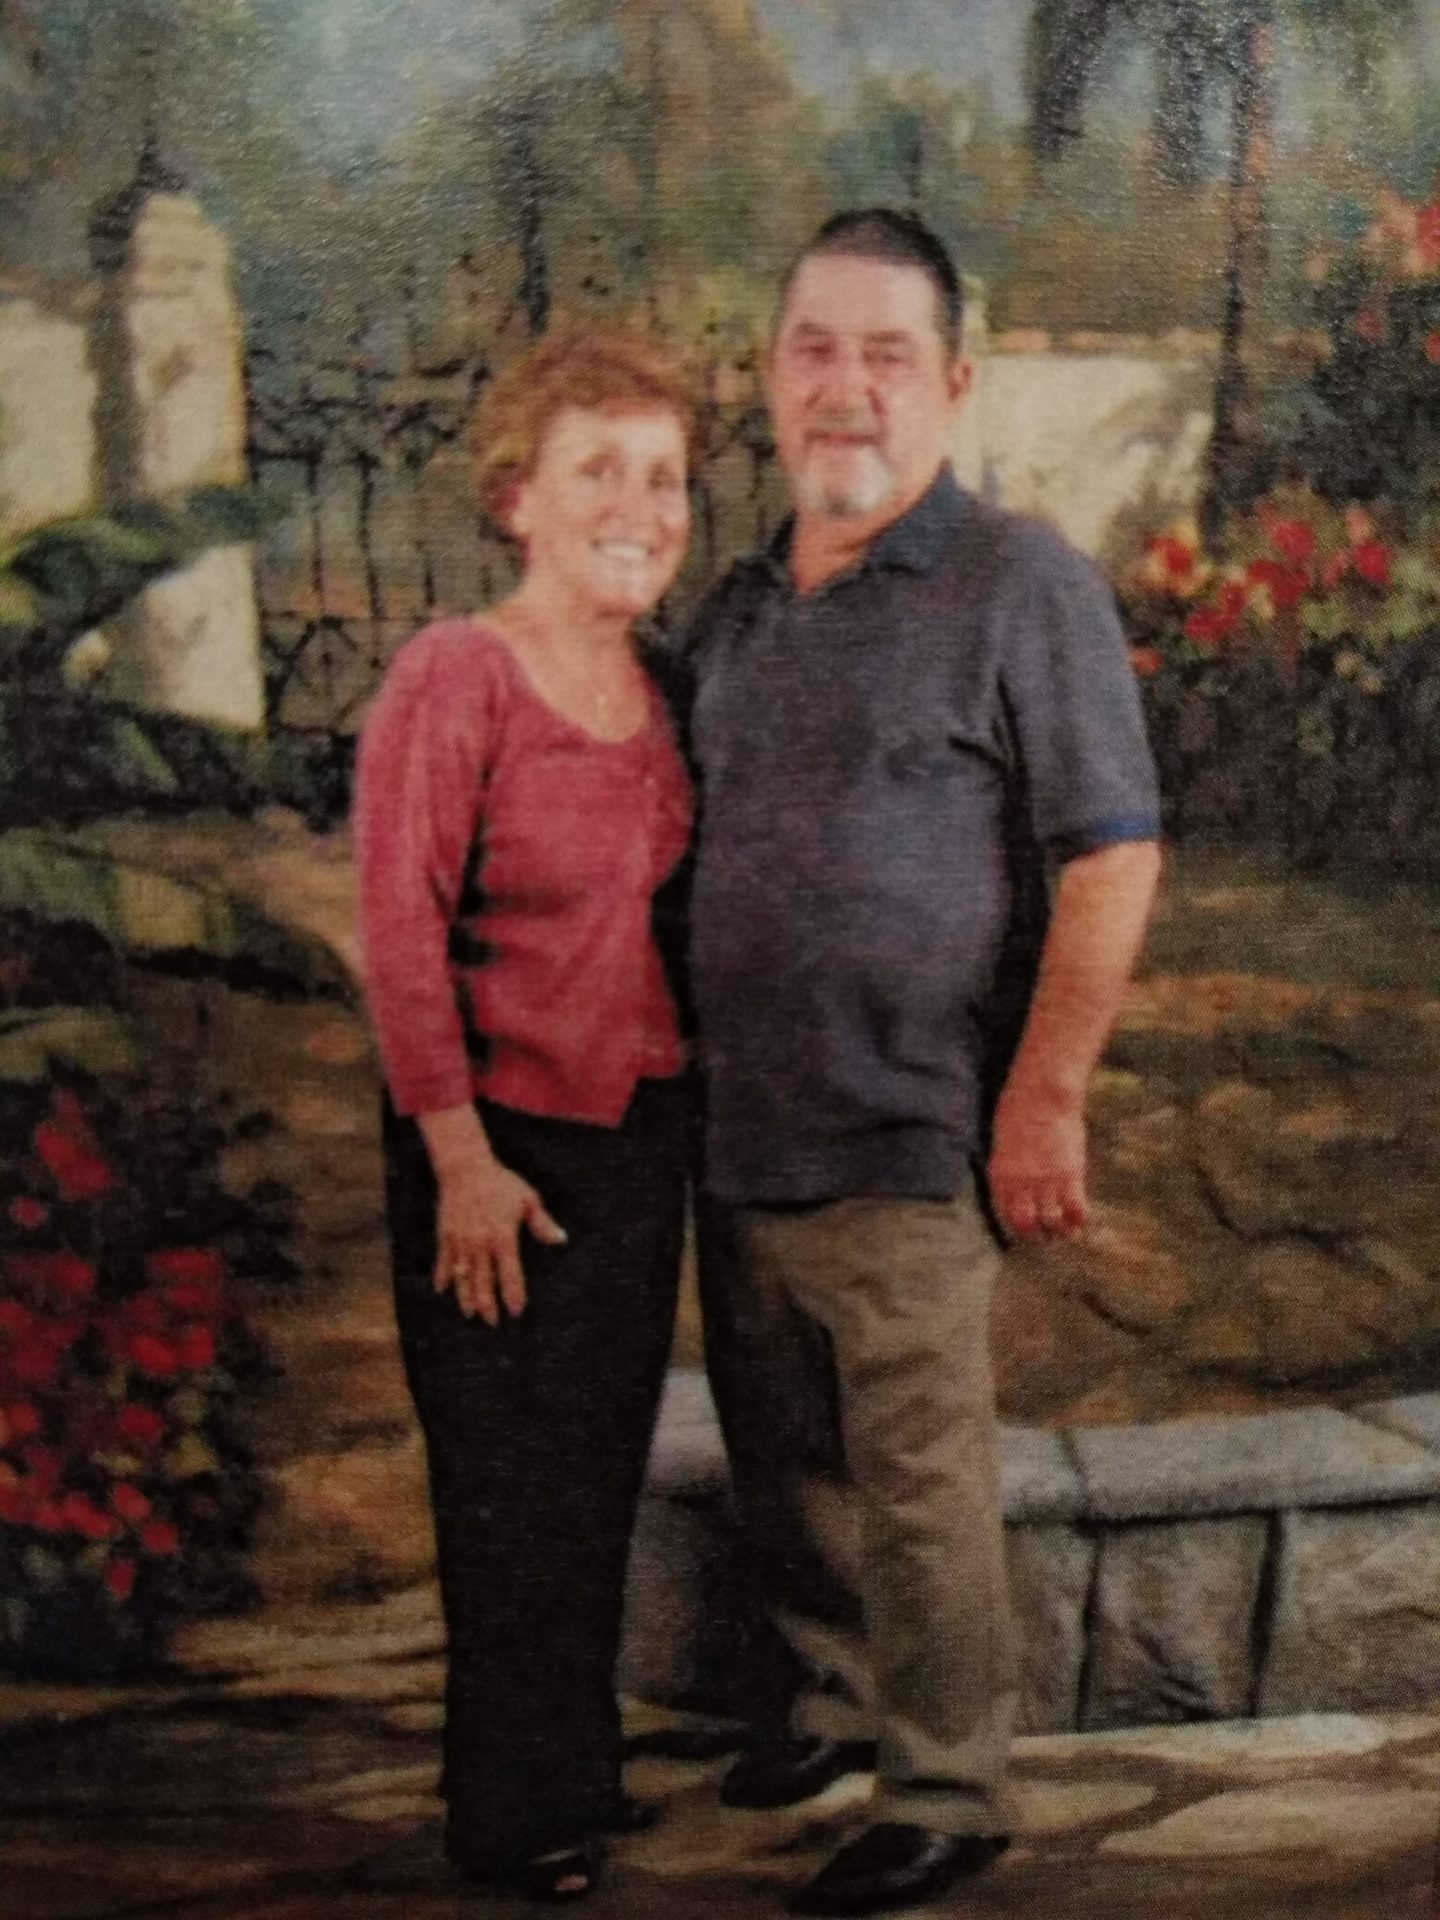 Mr. & Mrs. Shields